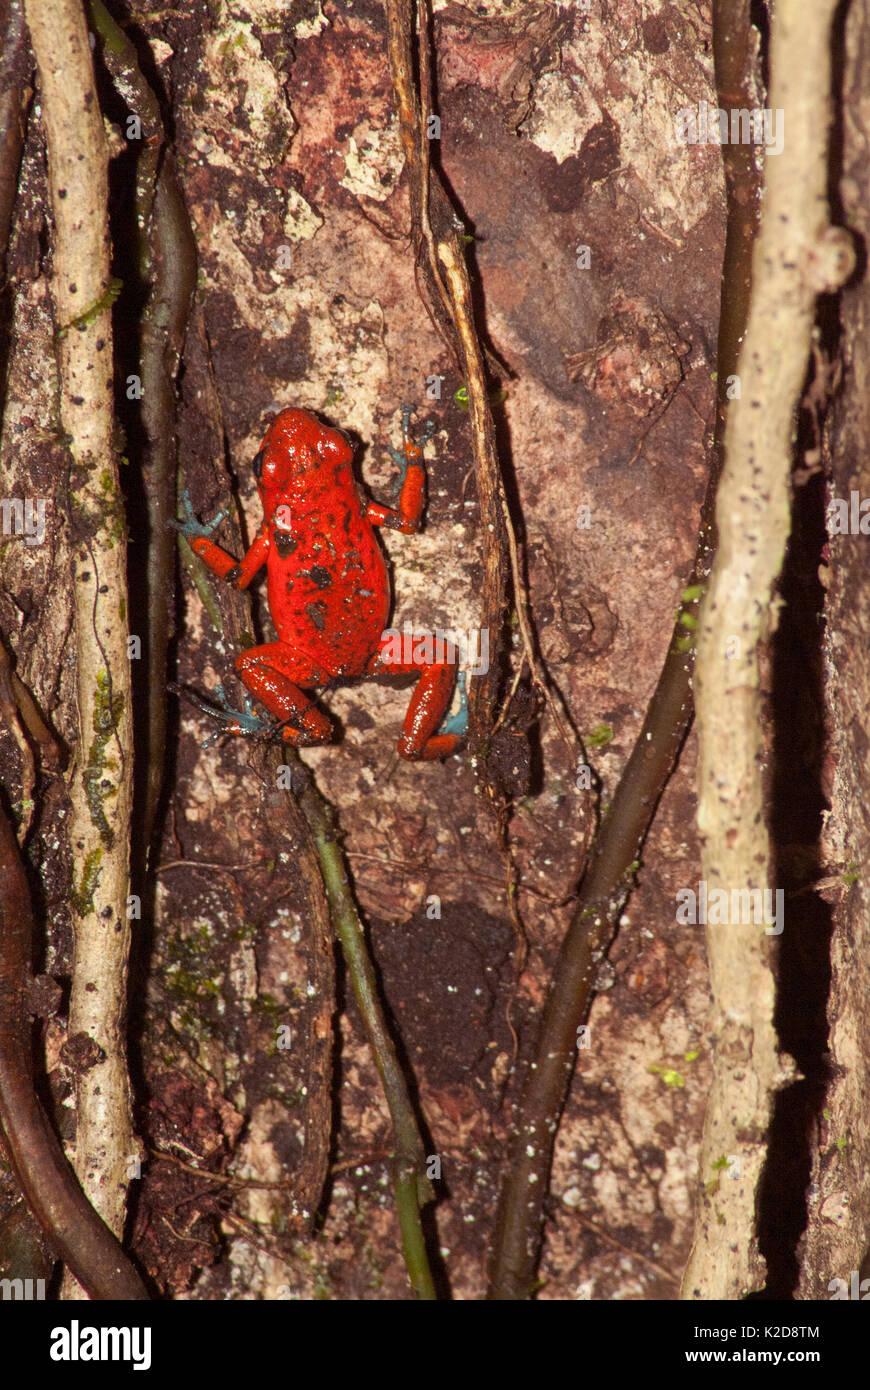 Strawberry Poison-dart Frog on Tree - Stock Image